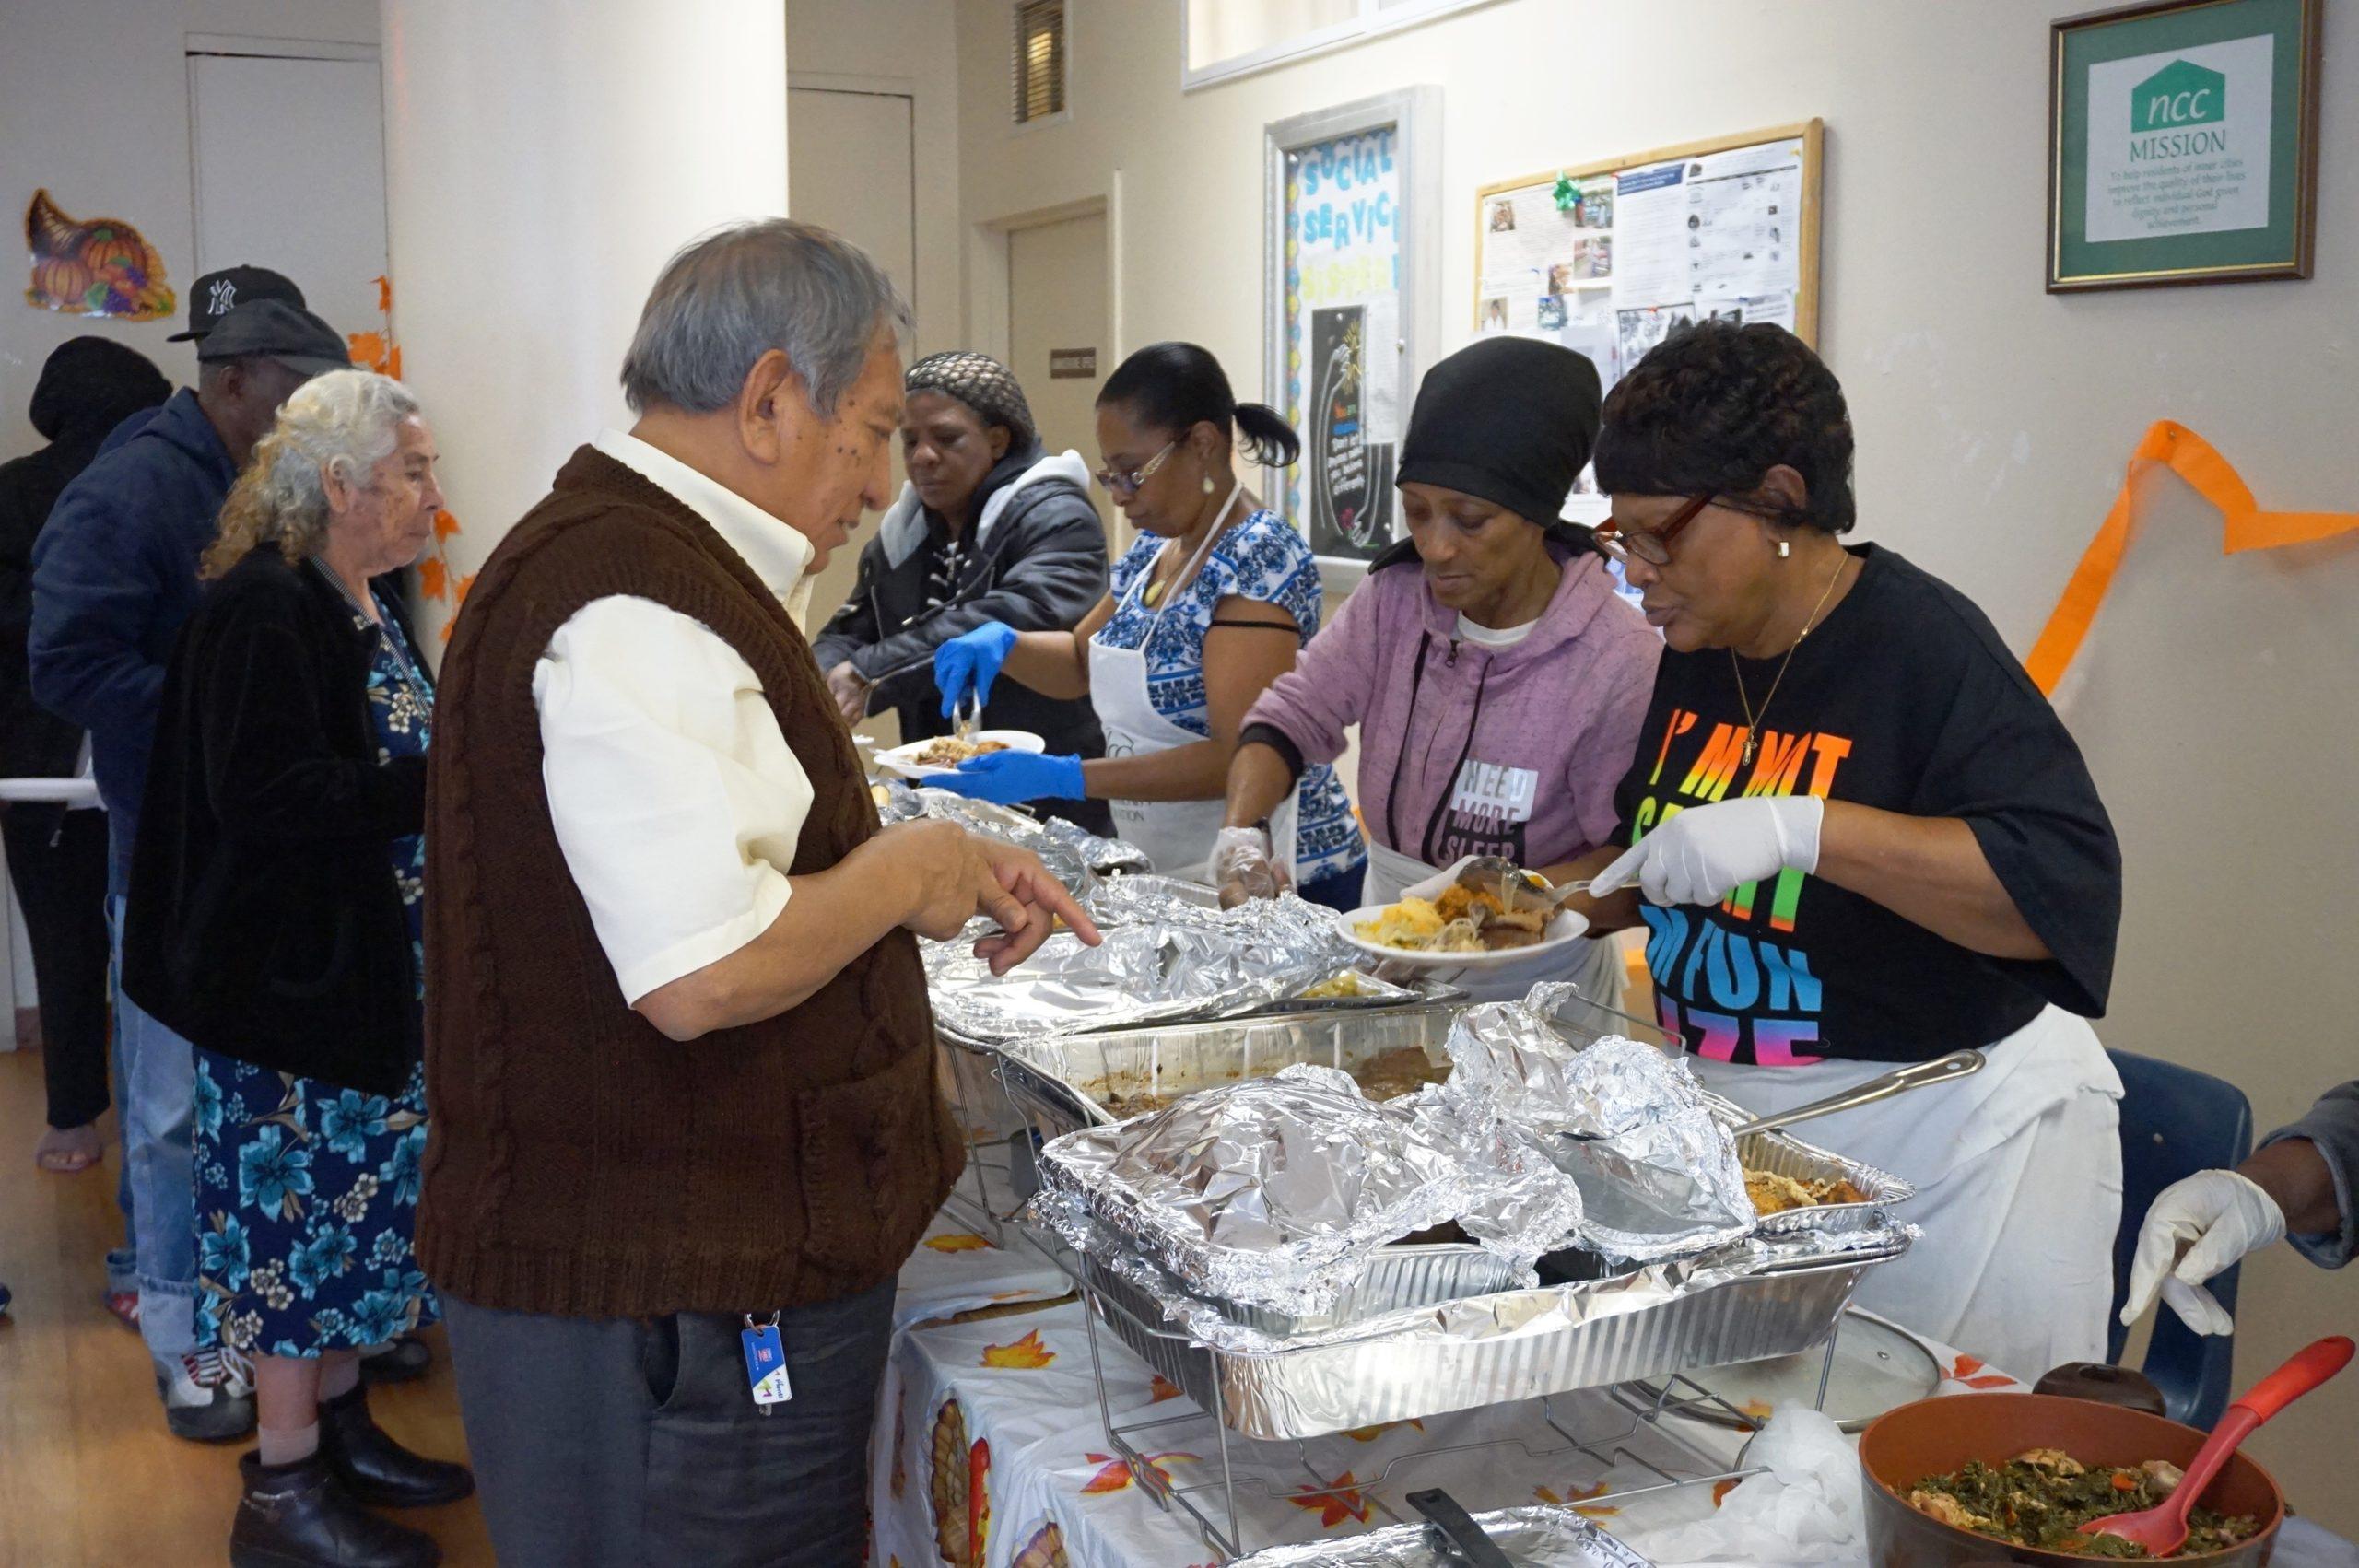 New Community Celebrates Thanksgiving 2017